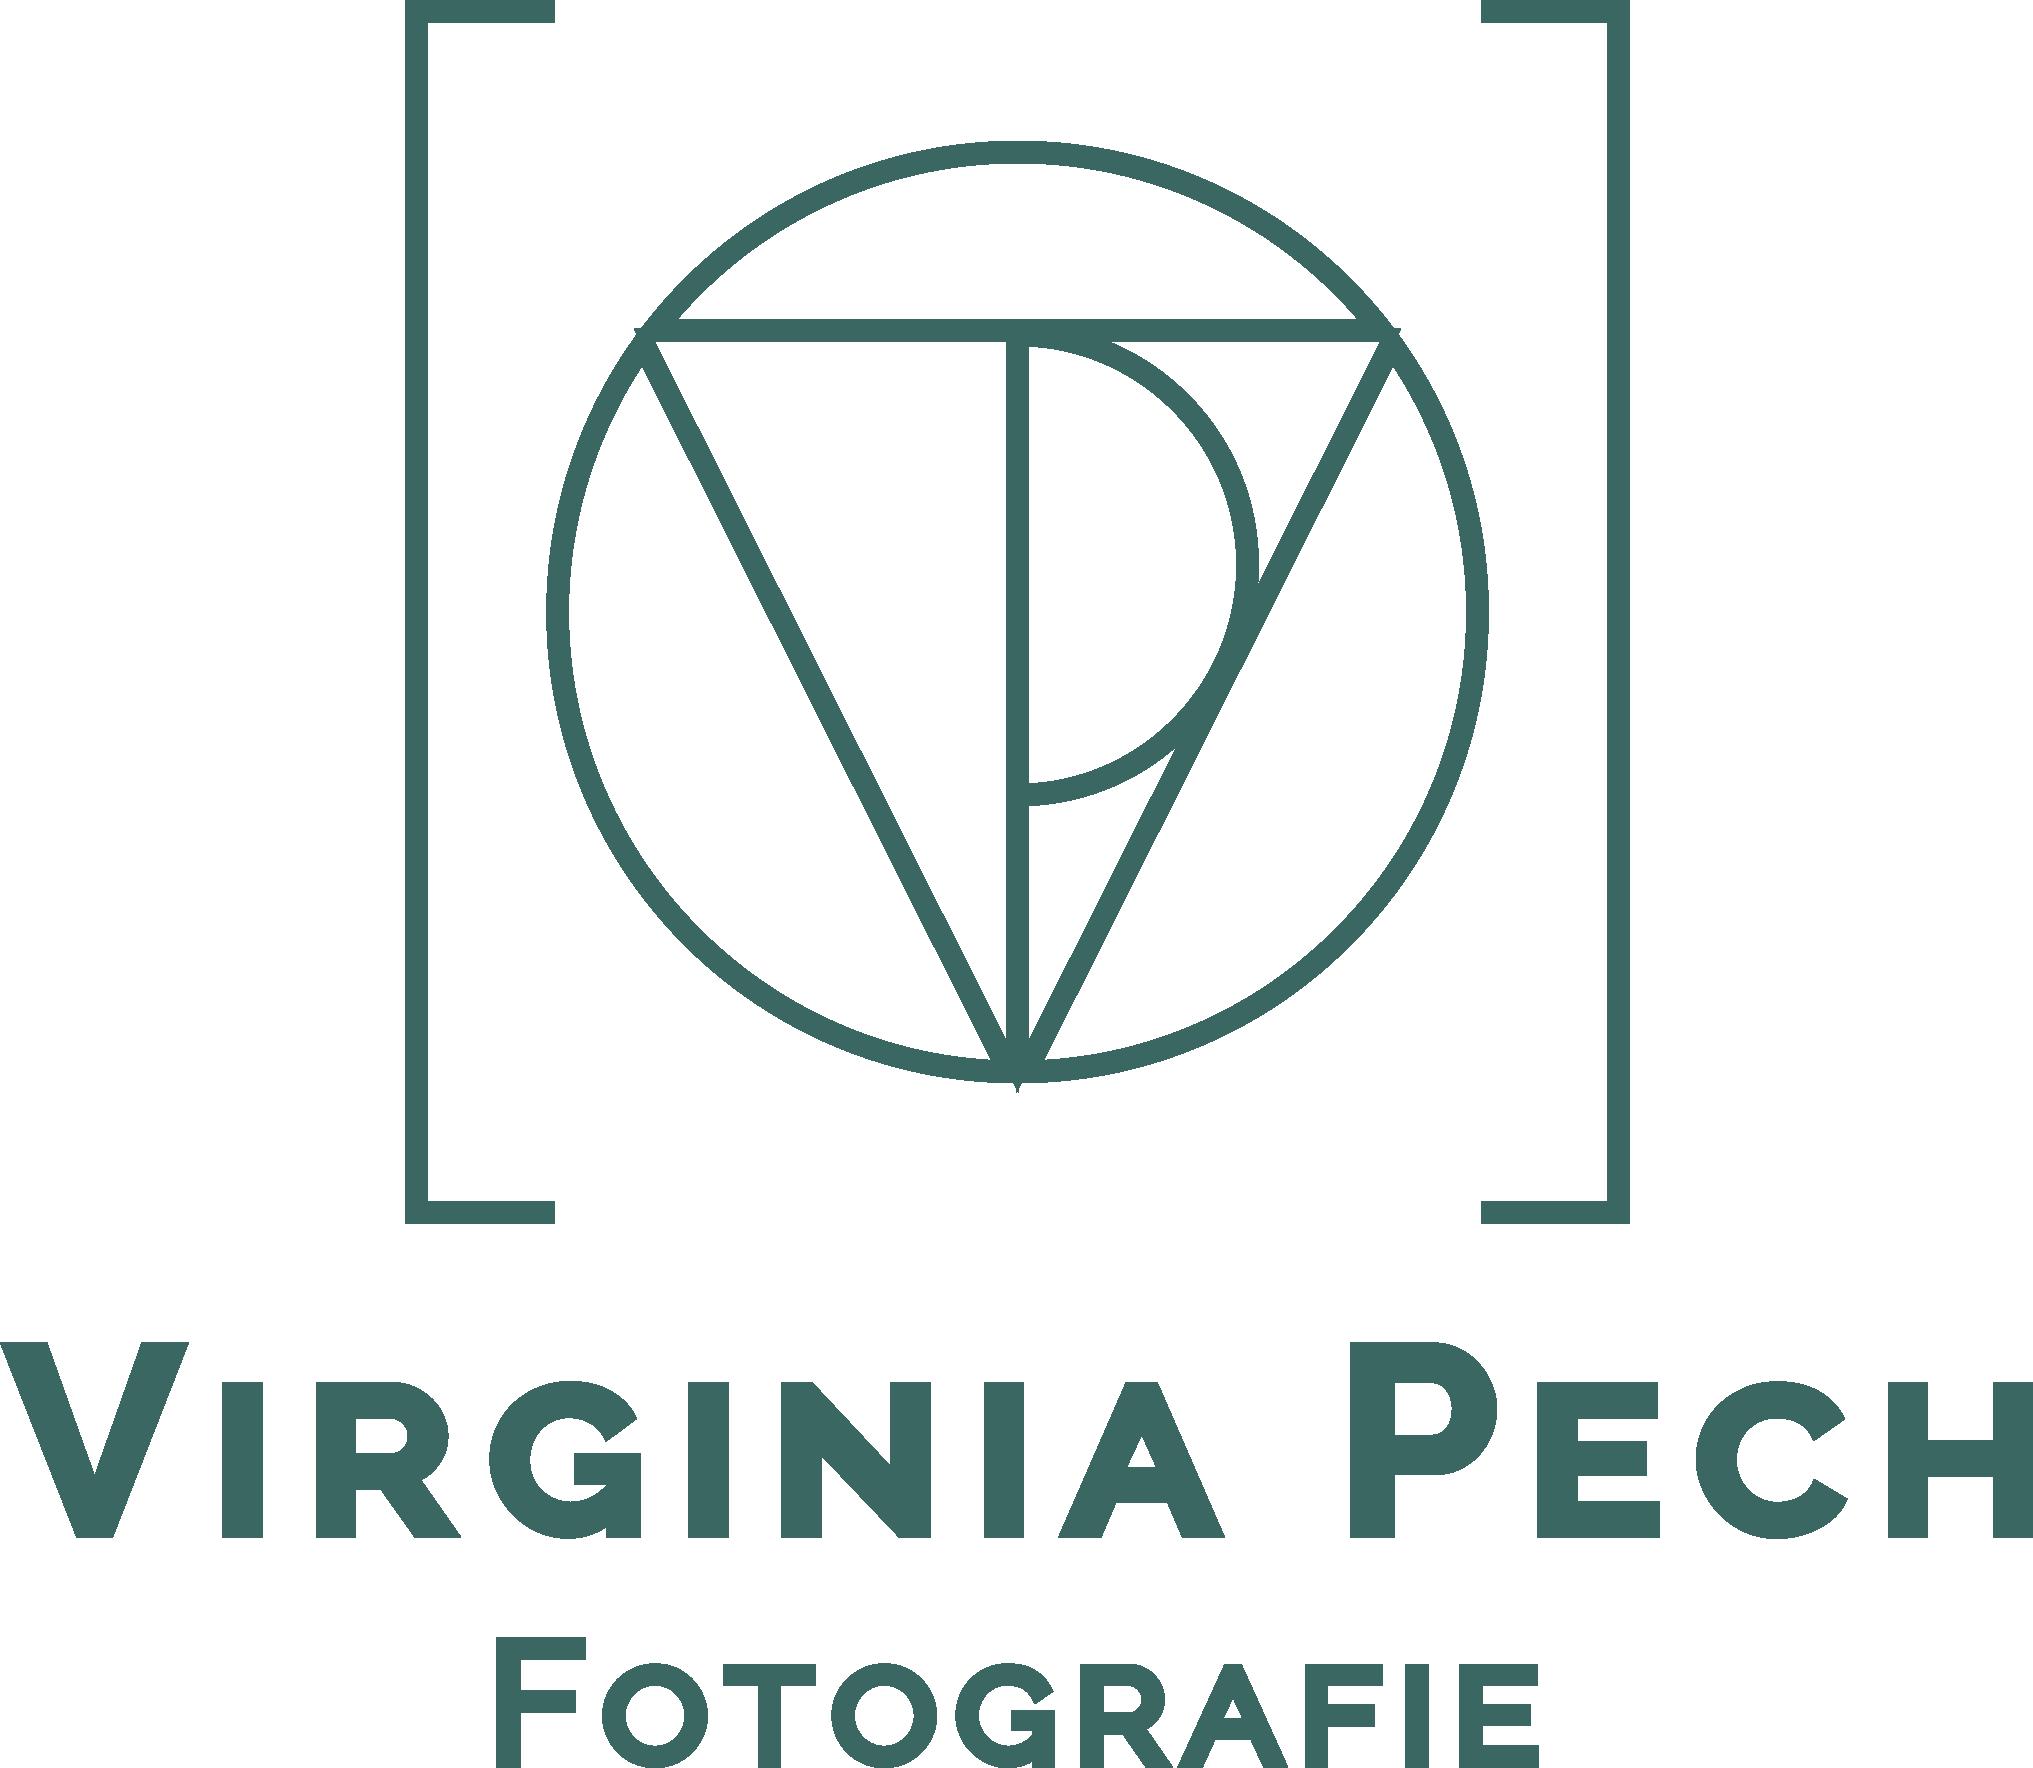 Virginia Pech Fotografie Berlin